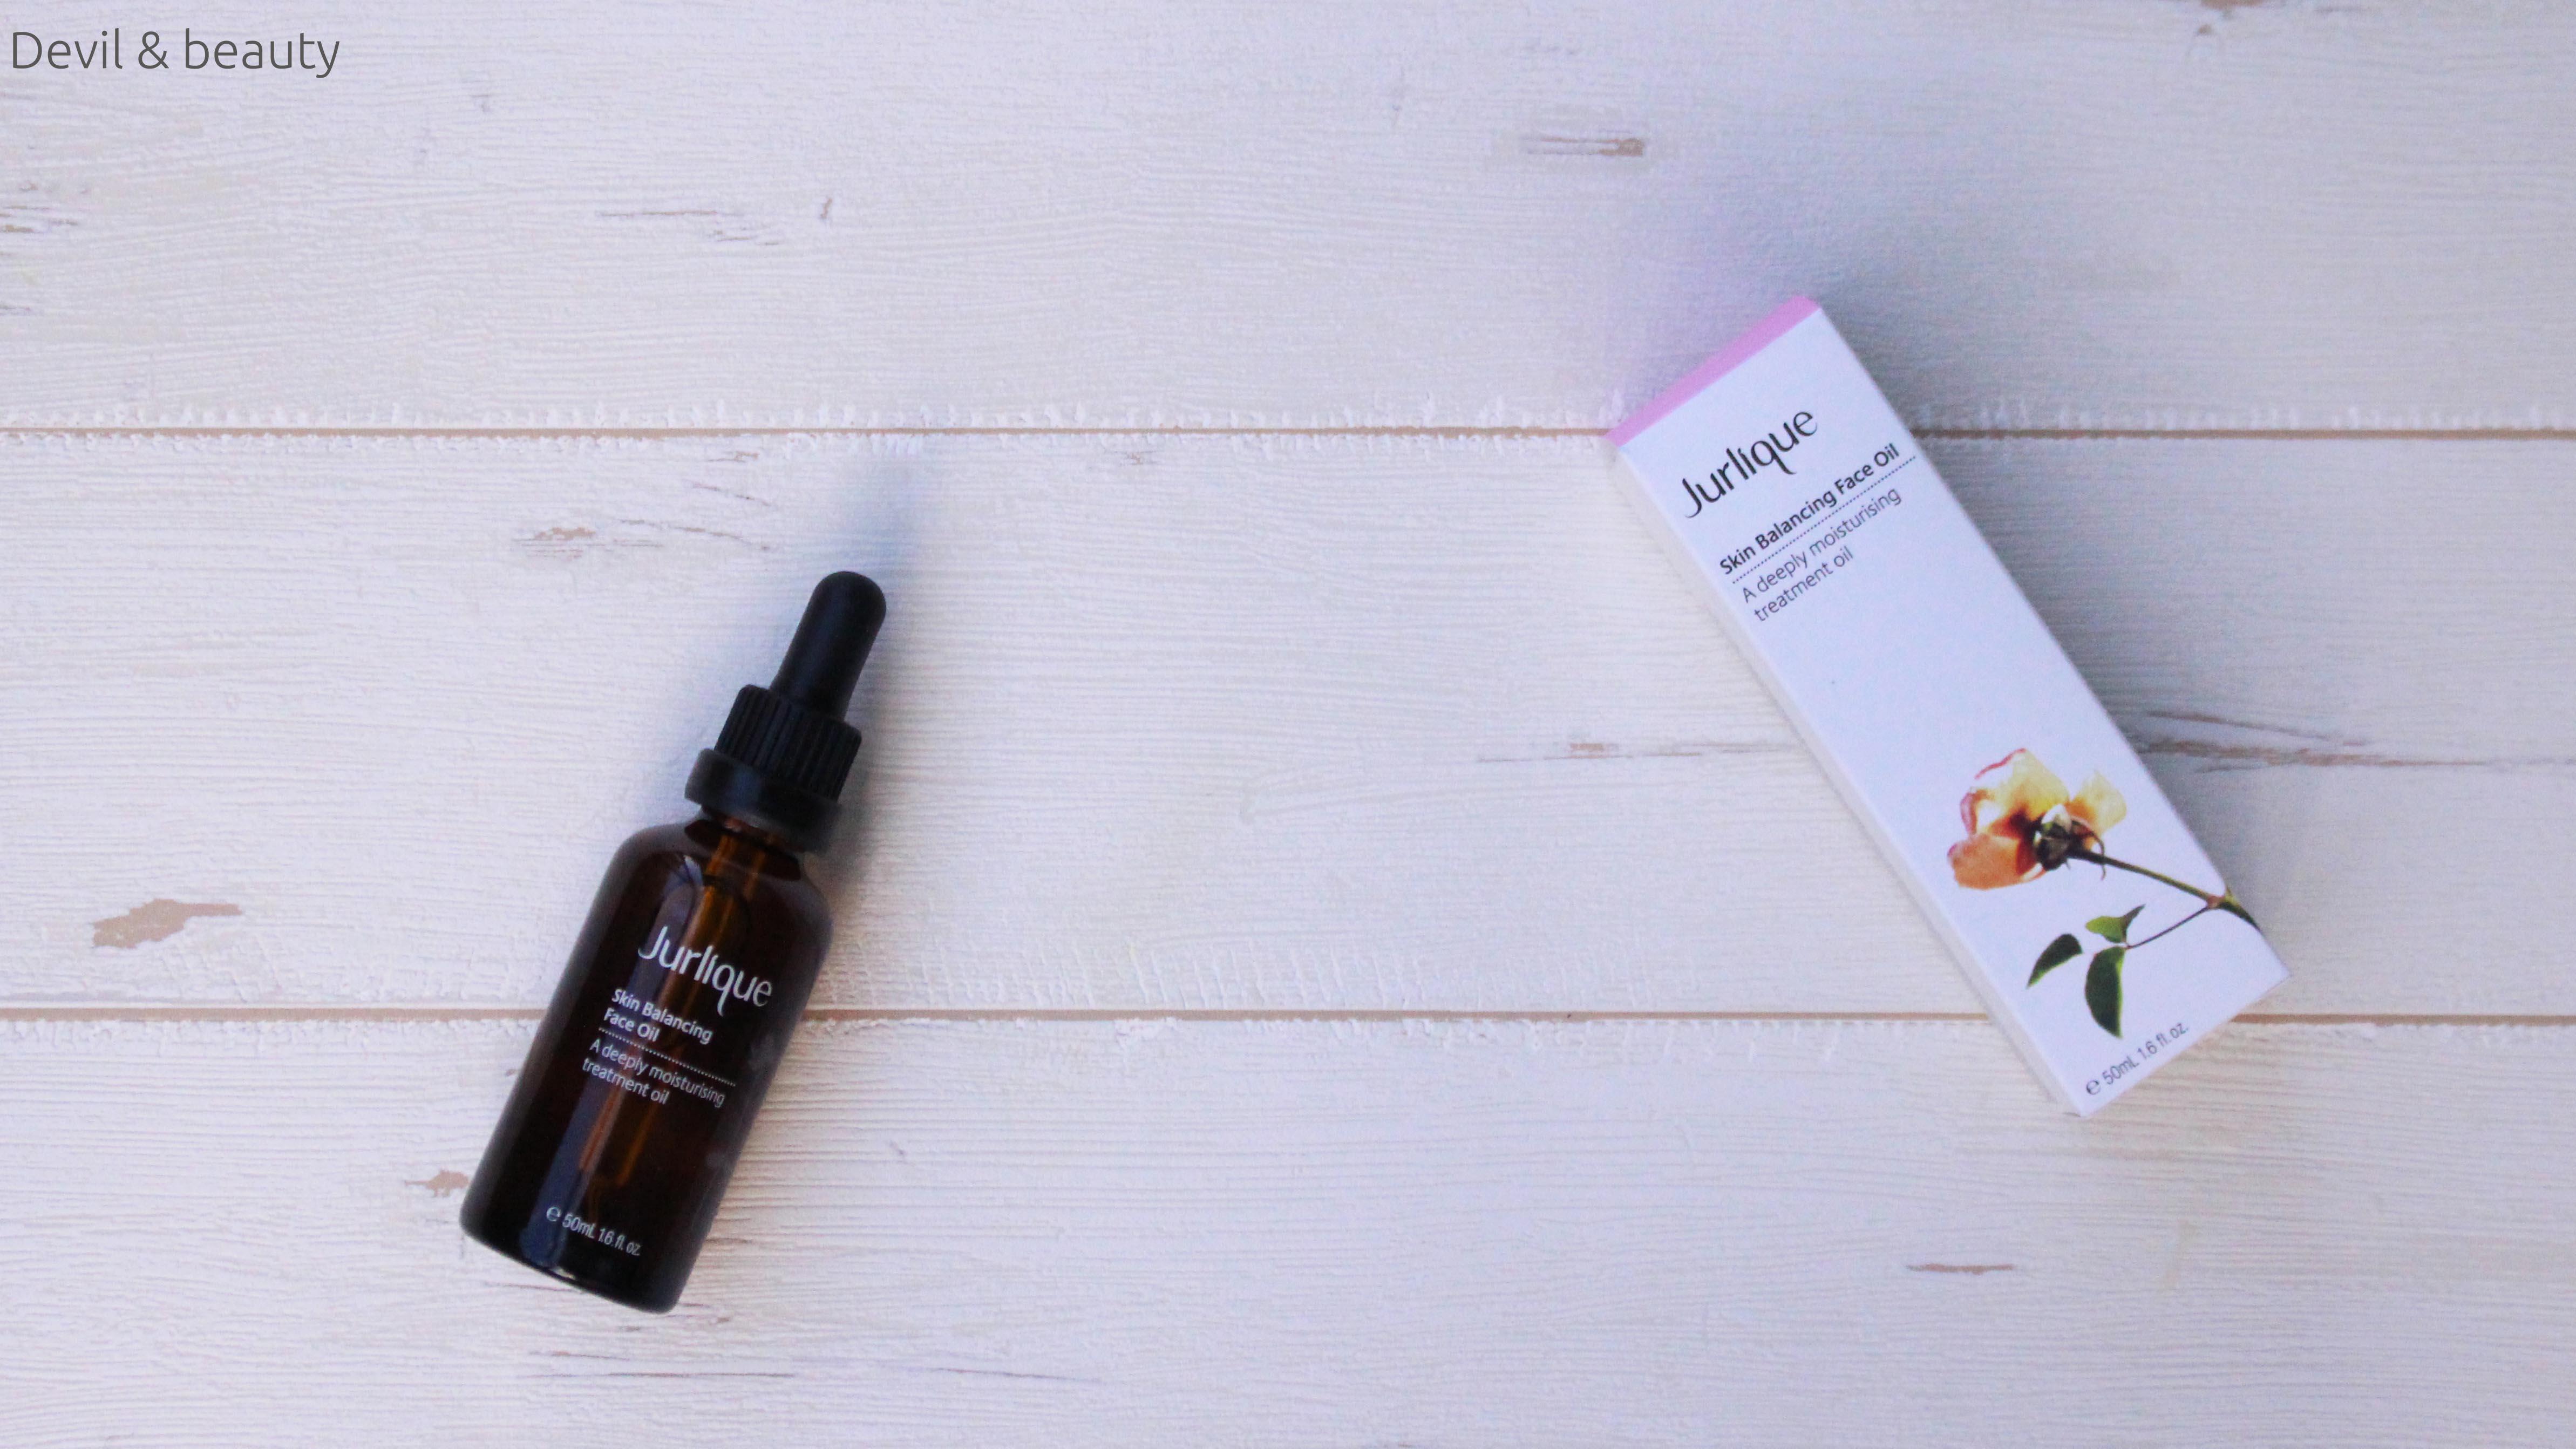 jurlique-skin-balancing-oil6 - image